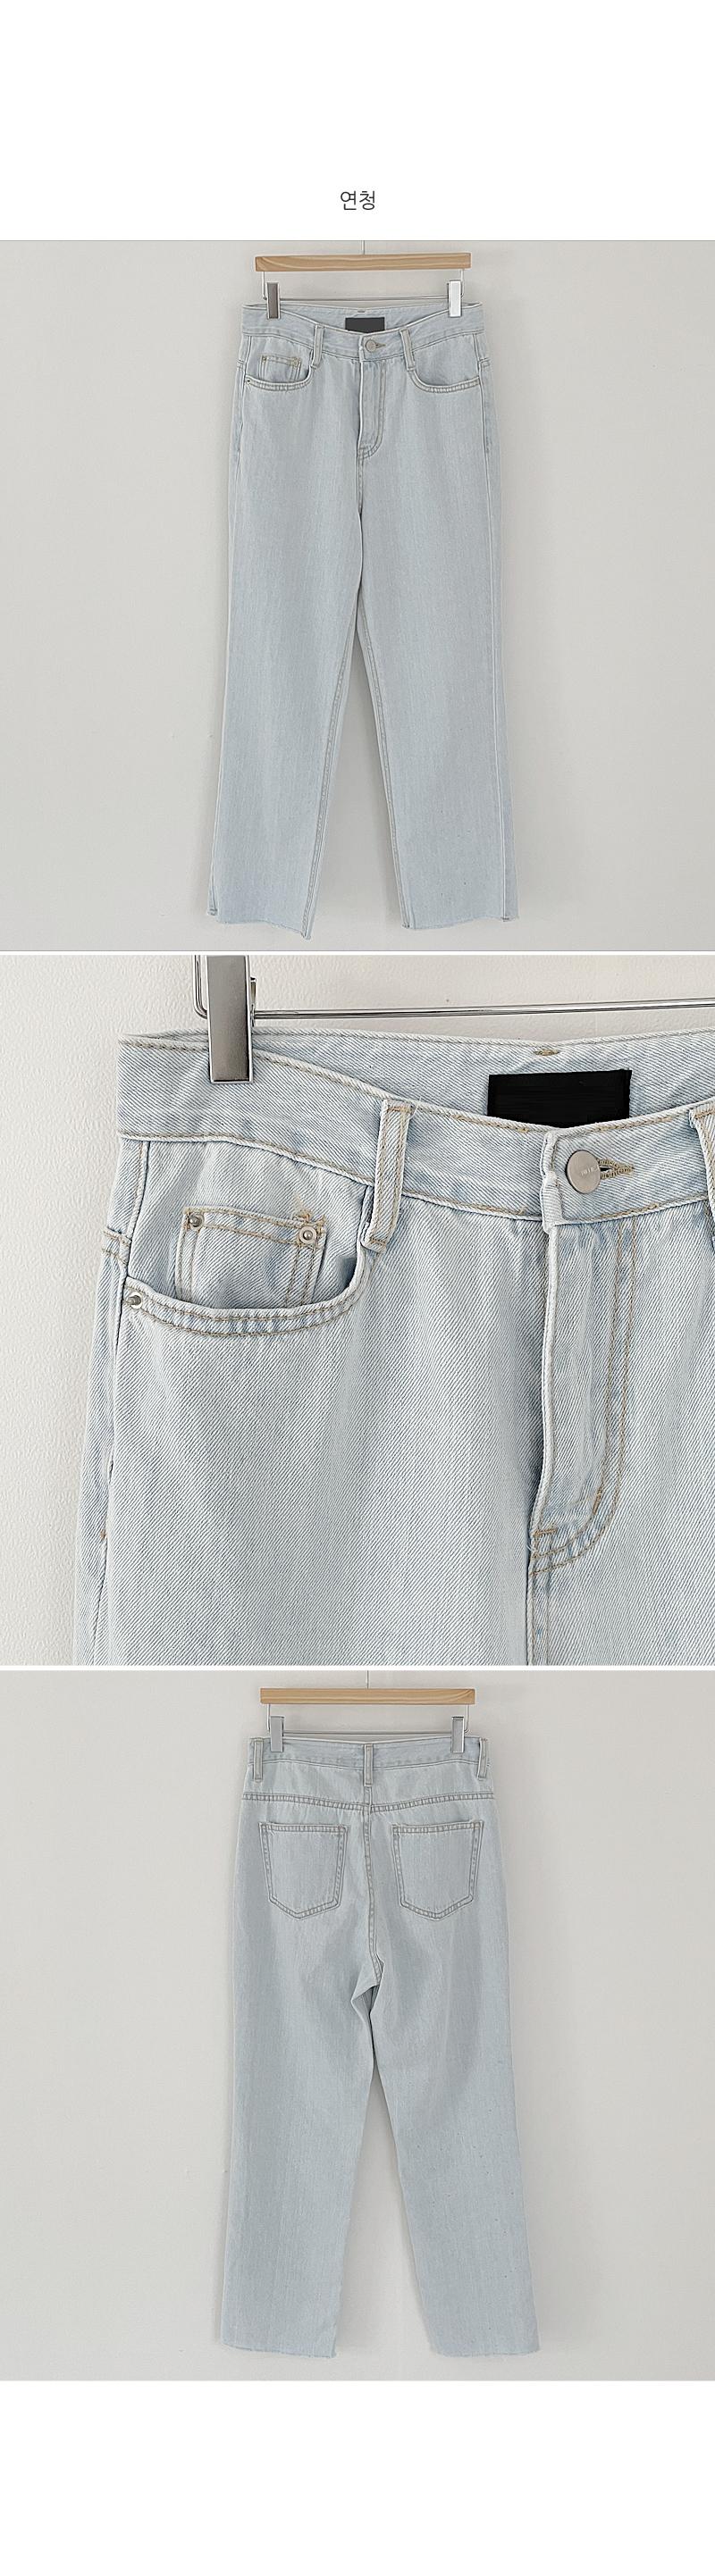 Liz Date Denim Pants